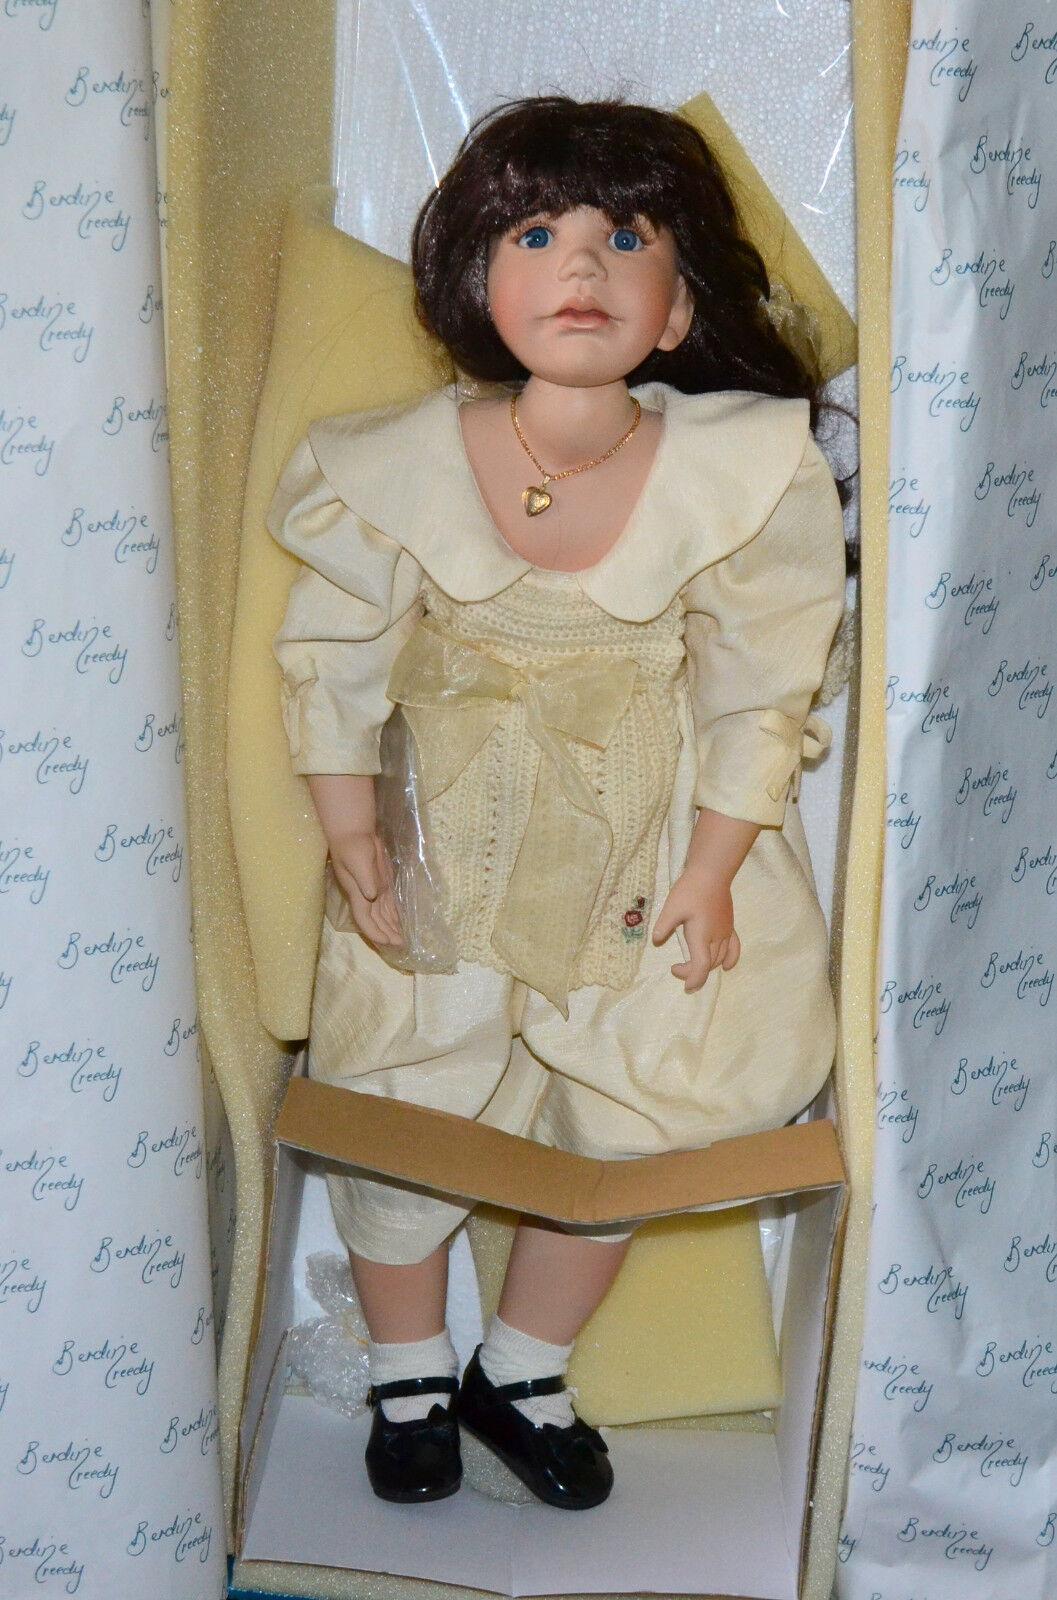 Berdine Creedy 28  Doll  Janina  Masterpiece Gallery 0435/1500 Limited in Box